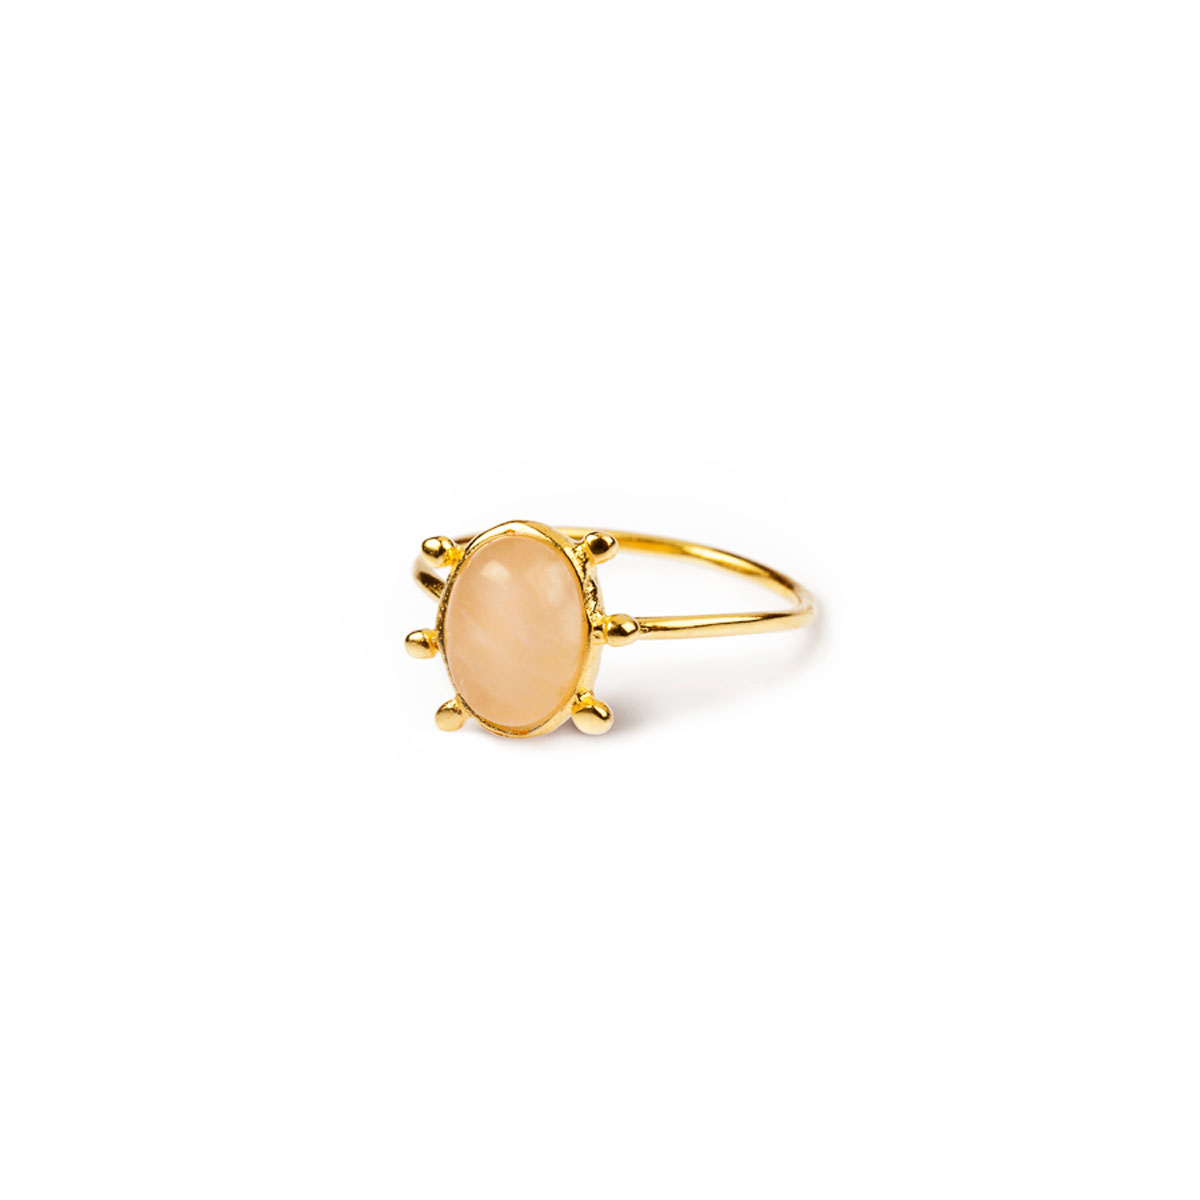 Ring-pink-quartz-danaigiannelli-Αντιγ-